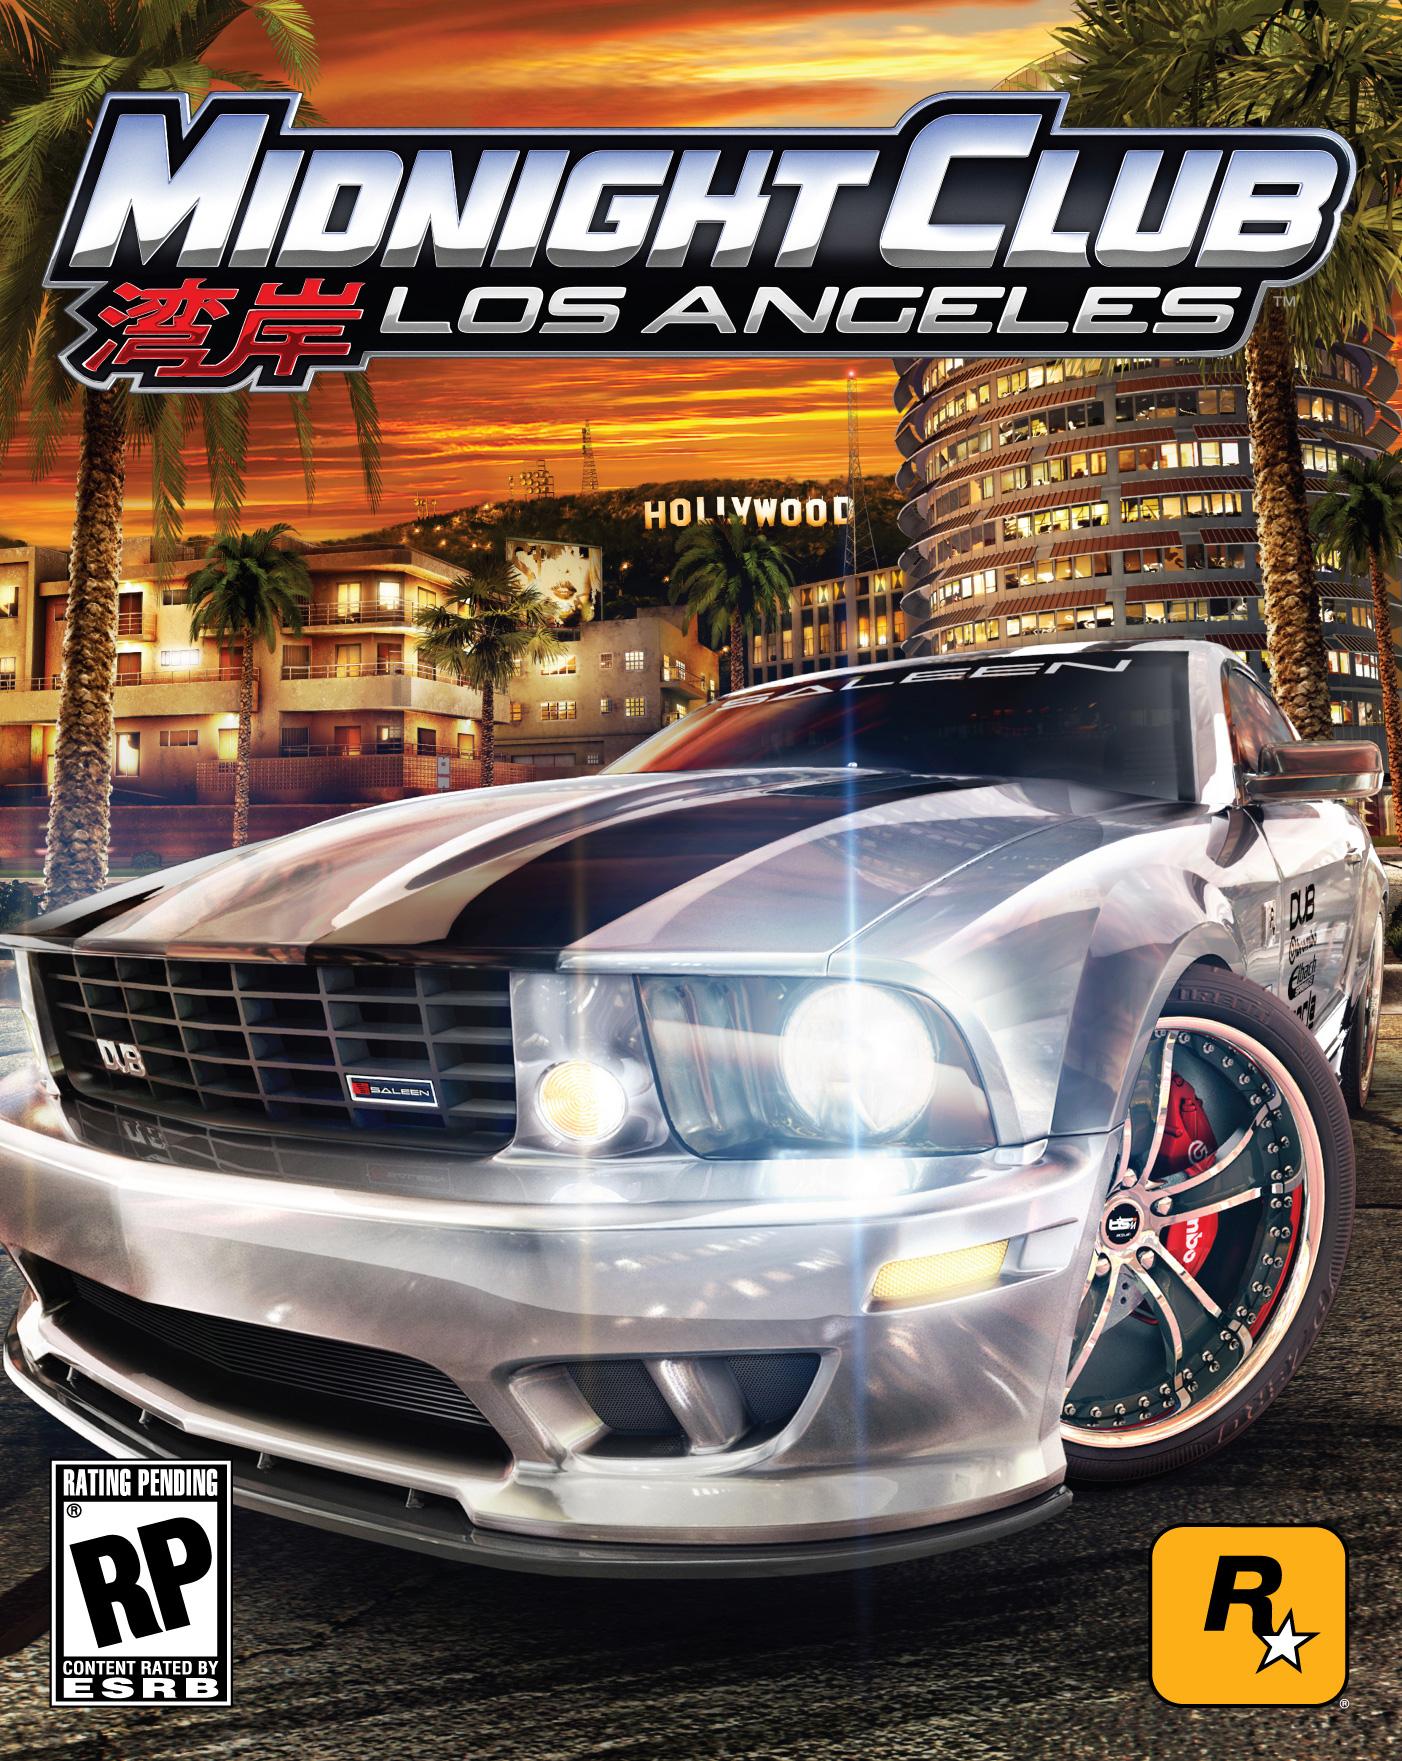 Midnight Club Garage - Midnight club los angeles map expansion